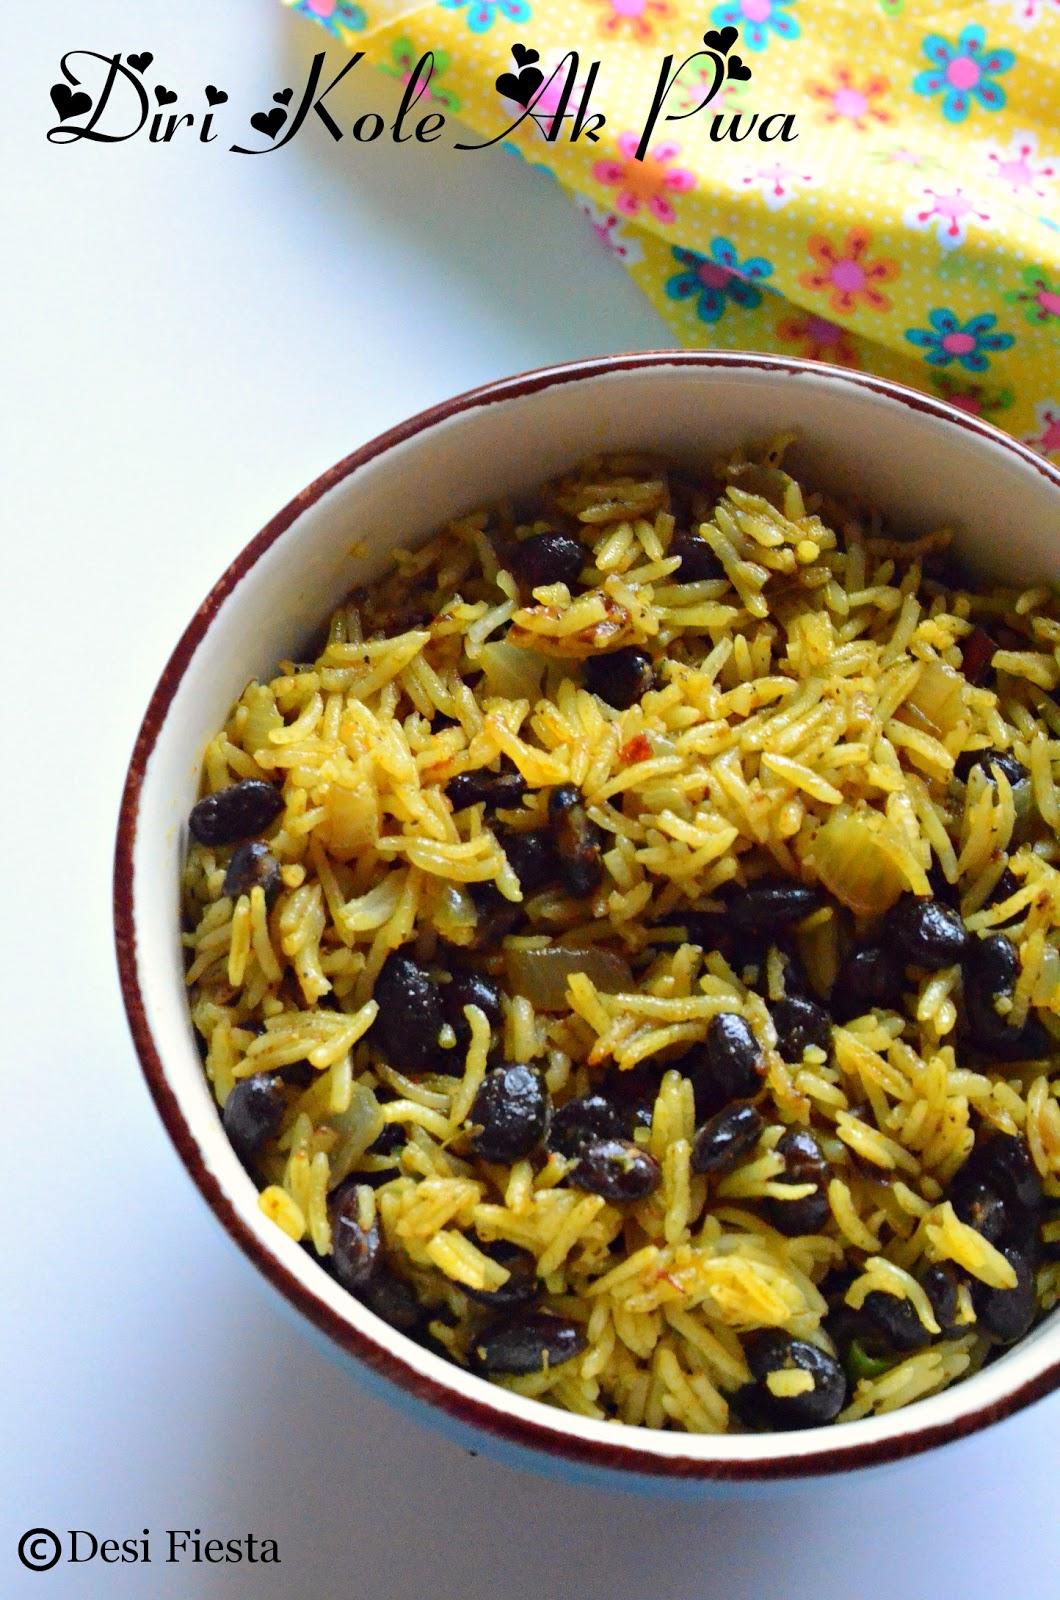 National dish of Haiti